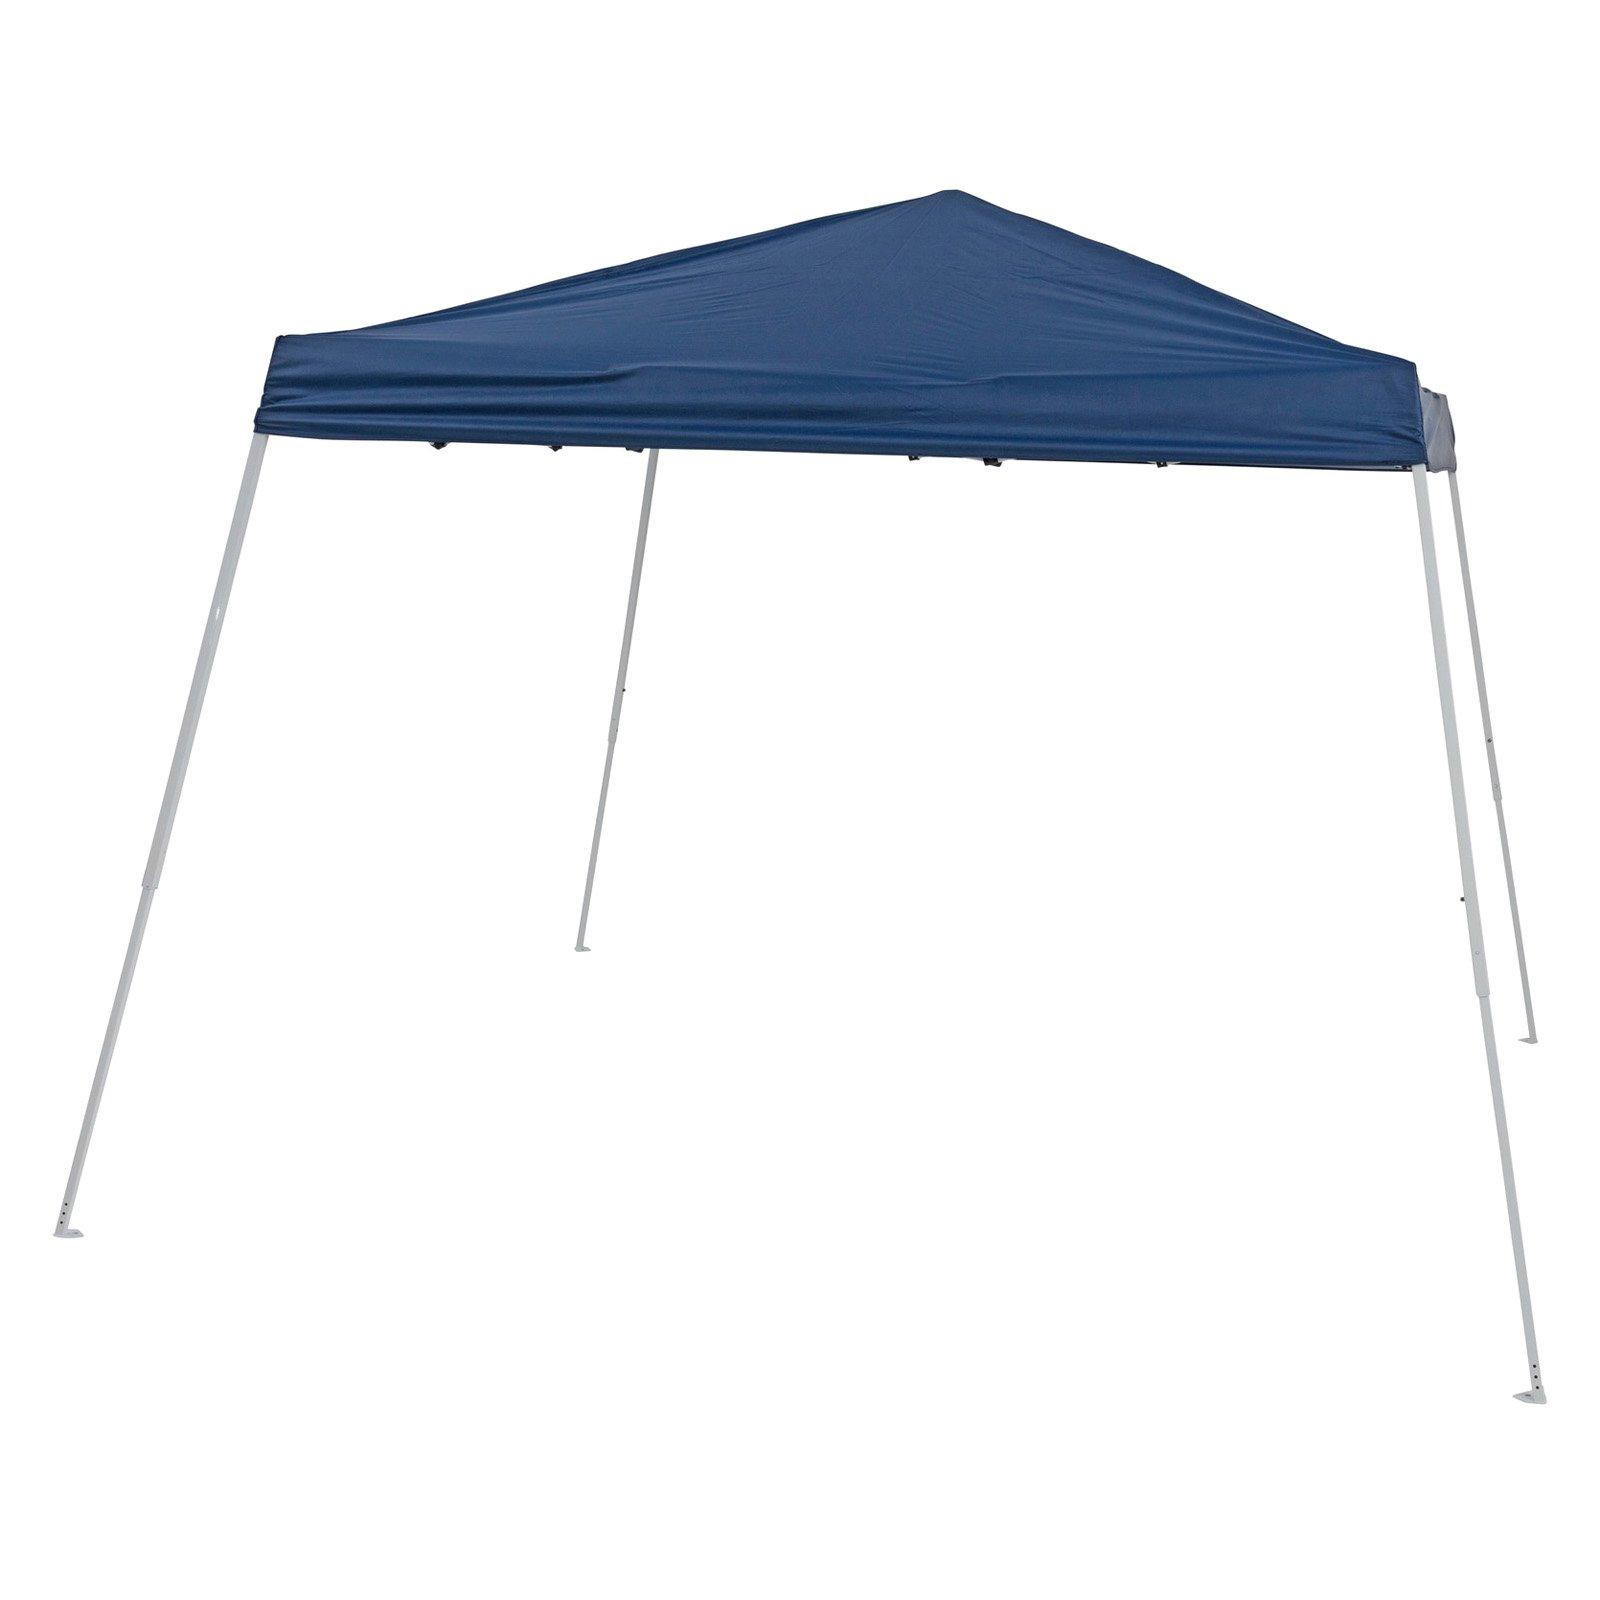 TrueShade Plus 8' x 8' Canopy Shade Instant Pop Up Folding Canopy